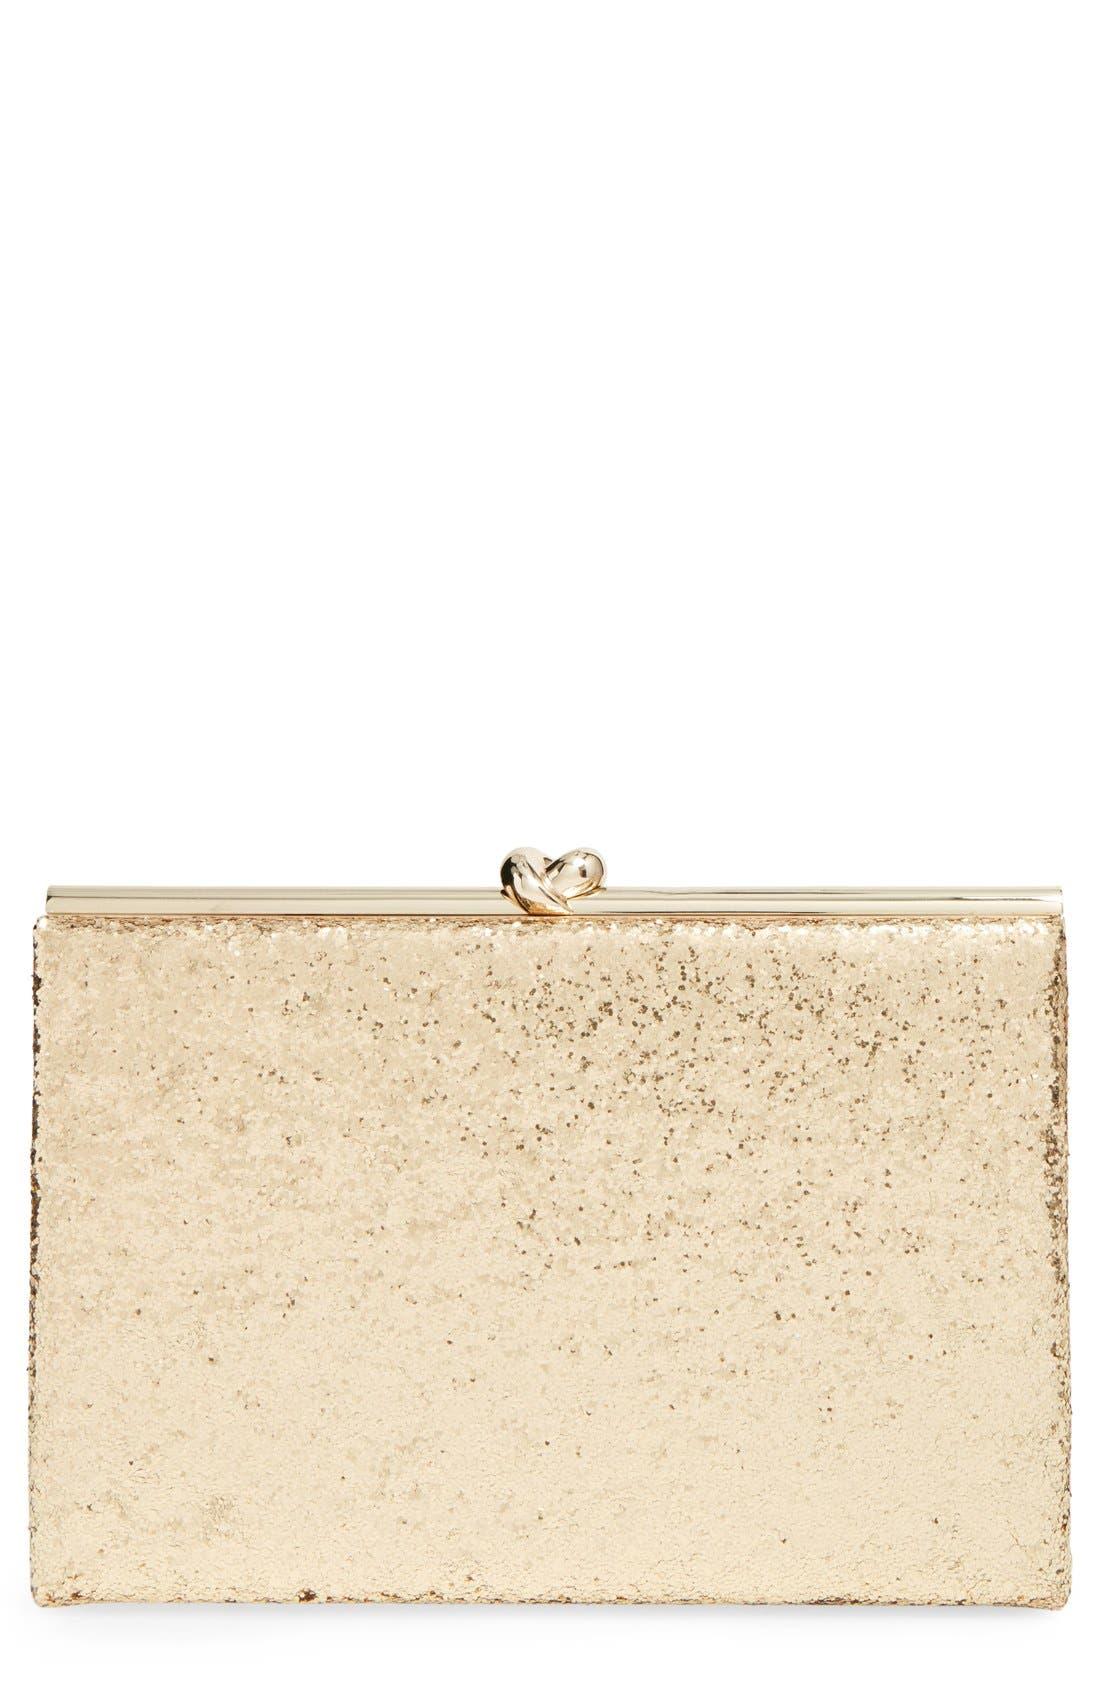 Alternate Image 1 Selected - kate spade new york 'wedding belles - gold knot' glitter box clutch